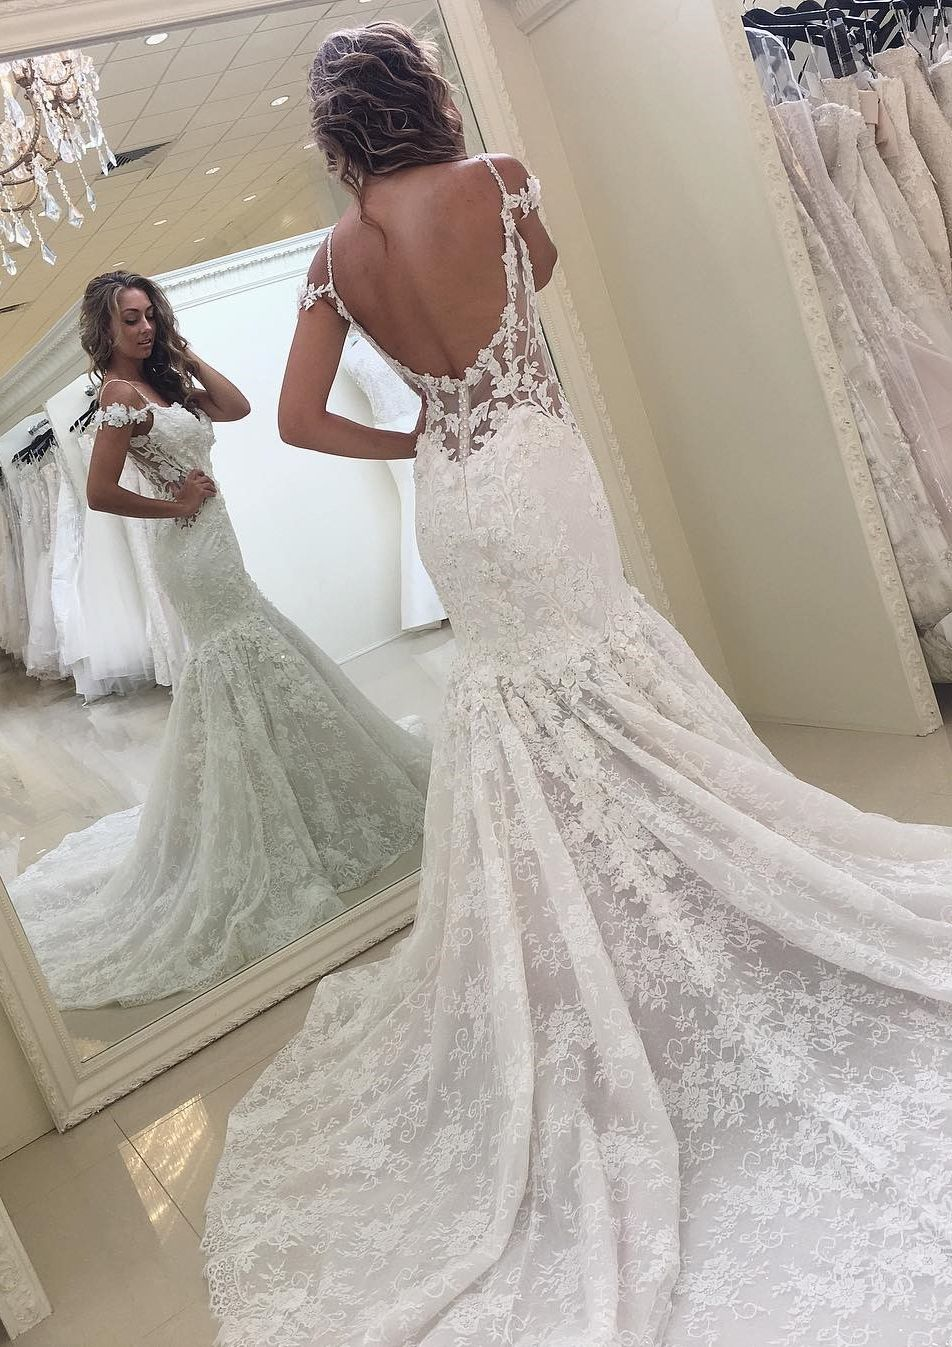 White Off The Shoulder Mermaid Lace Modern Wedding Dress Lace Wedding Dress Vintage Bridal Dresses Lace Wedding Dresses Lace [ 1347 x 952 Pixel ]